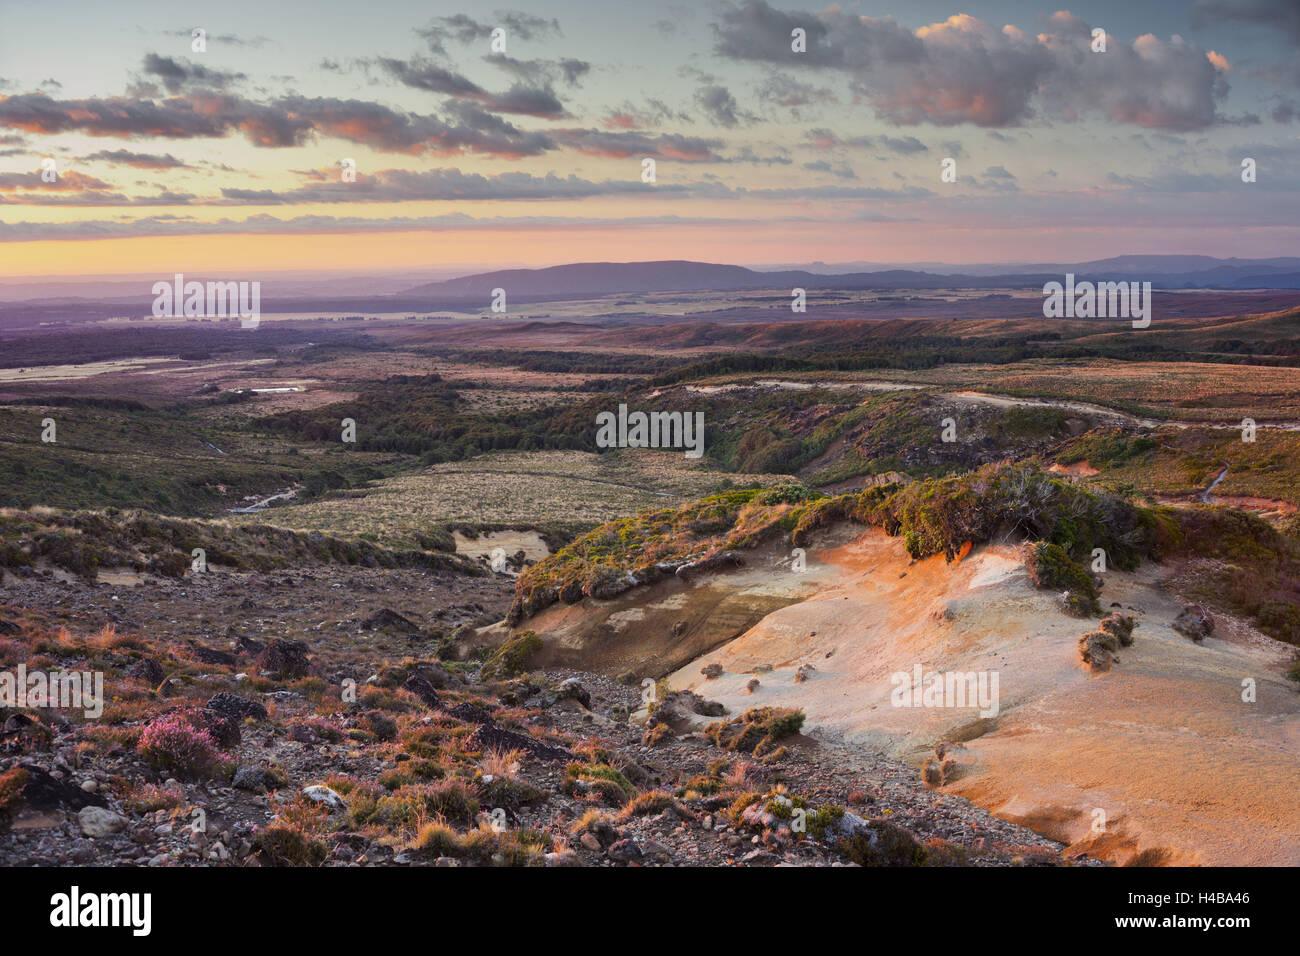 Tongariro National Park, Manawatu-Manganui, north Island, New Zealand - Stock Image